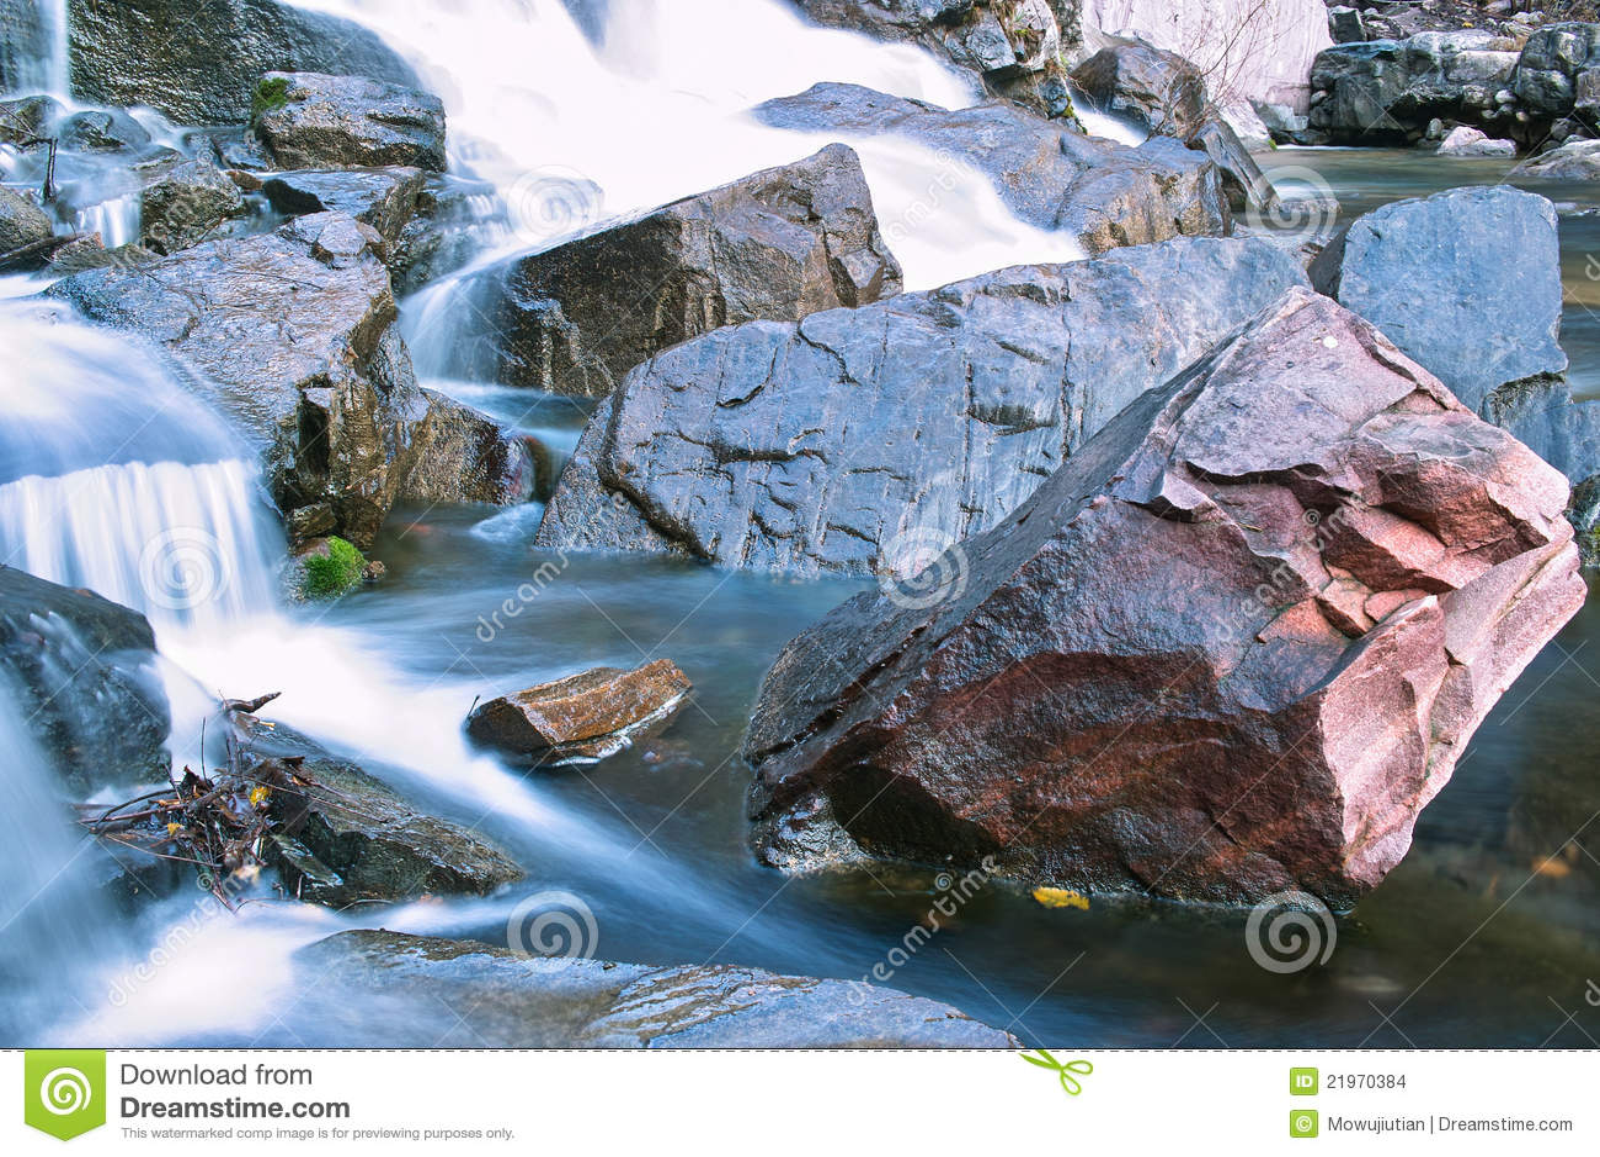 Stream rushing over boulders